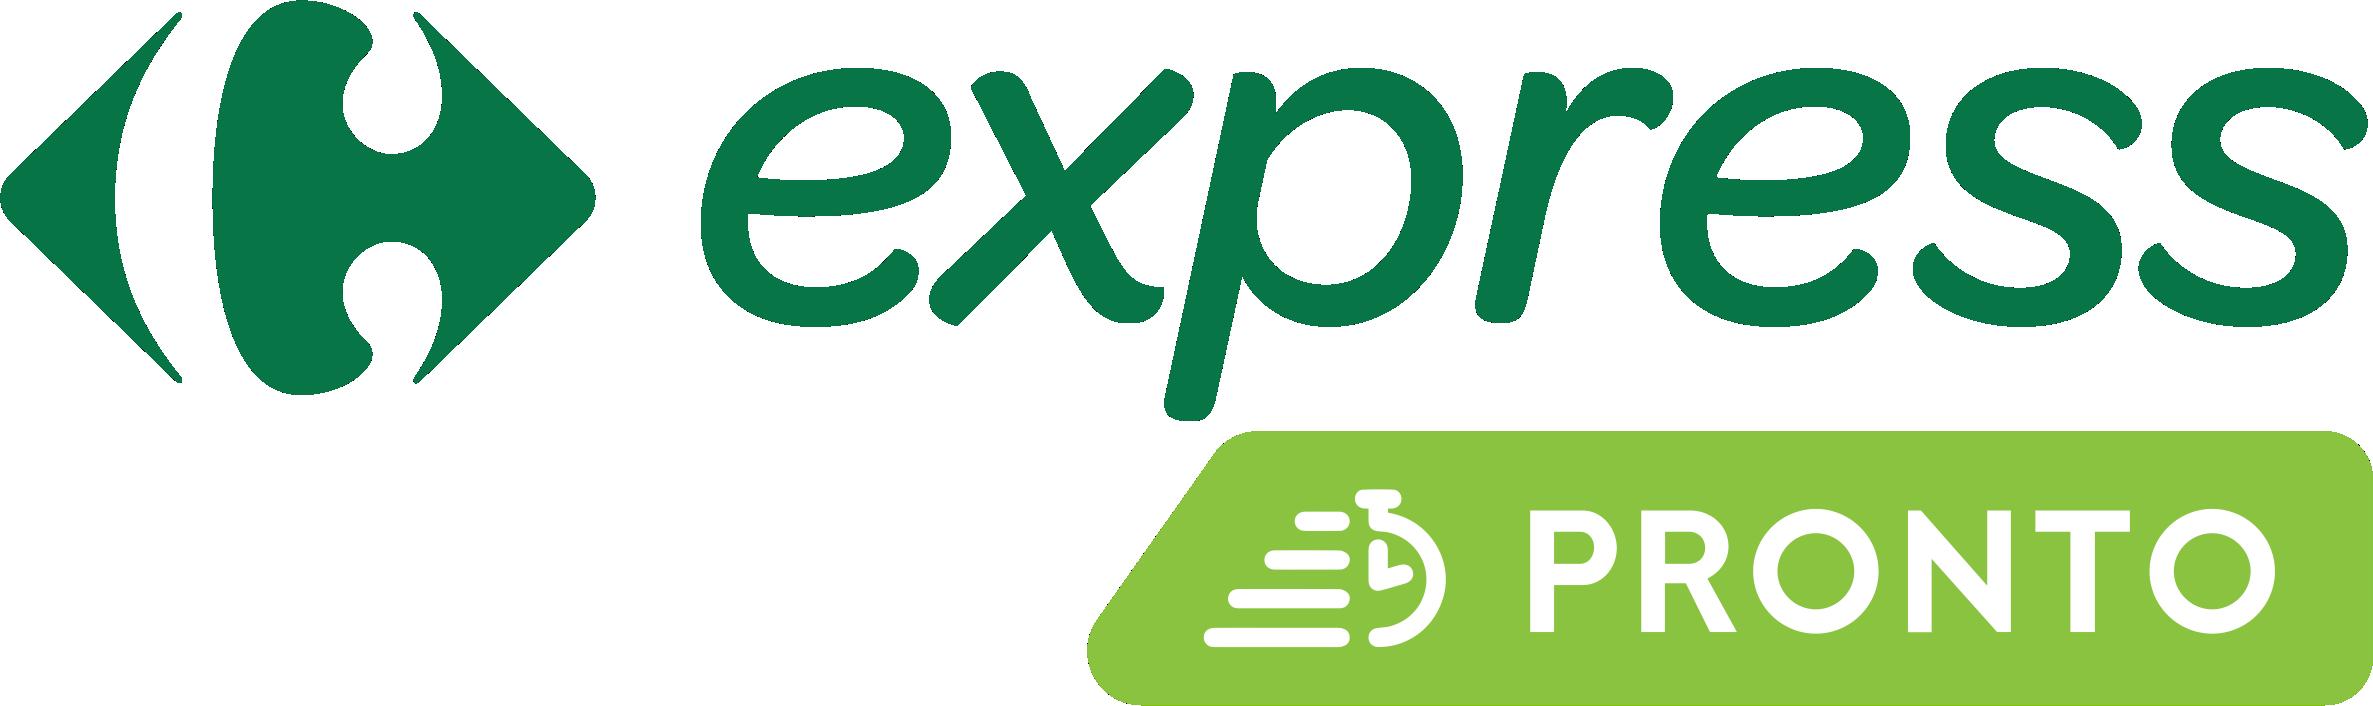 Pronto Express